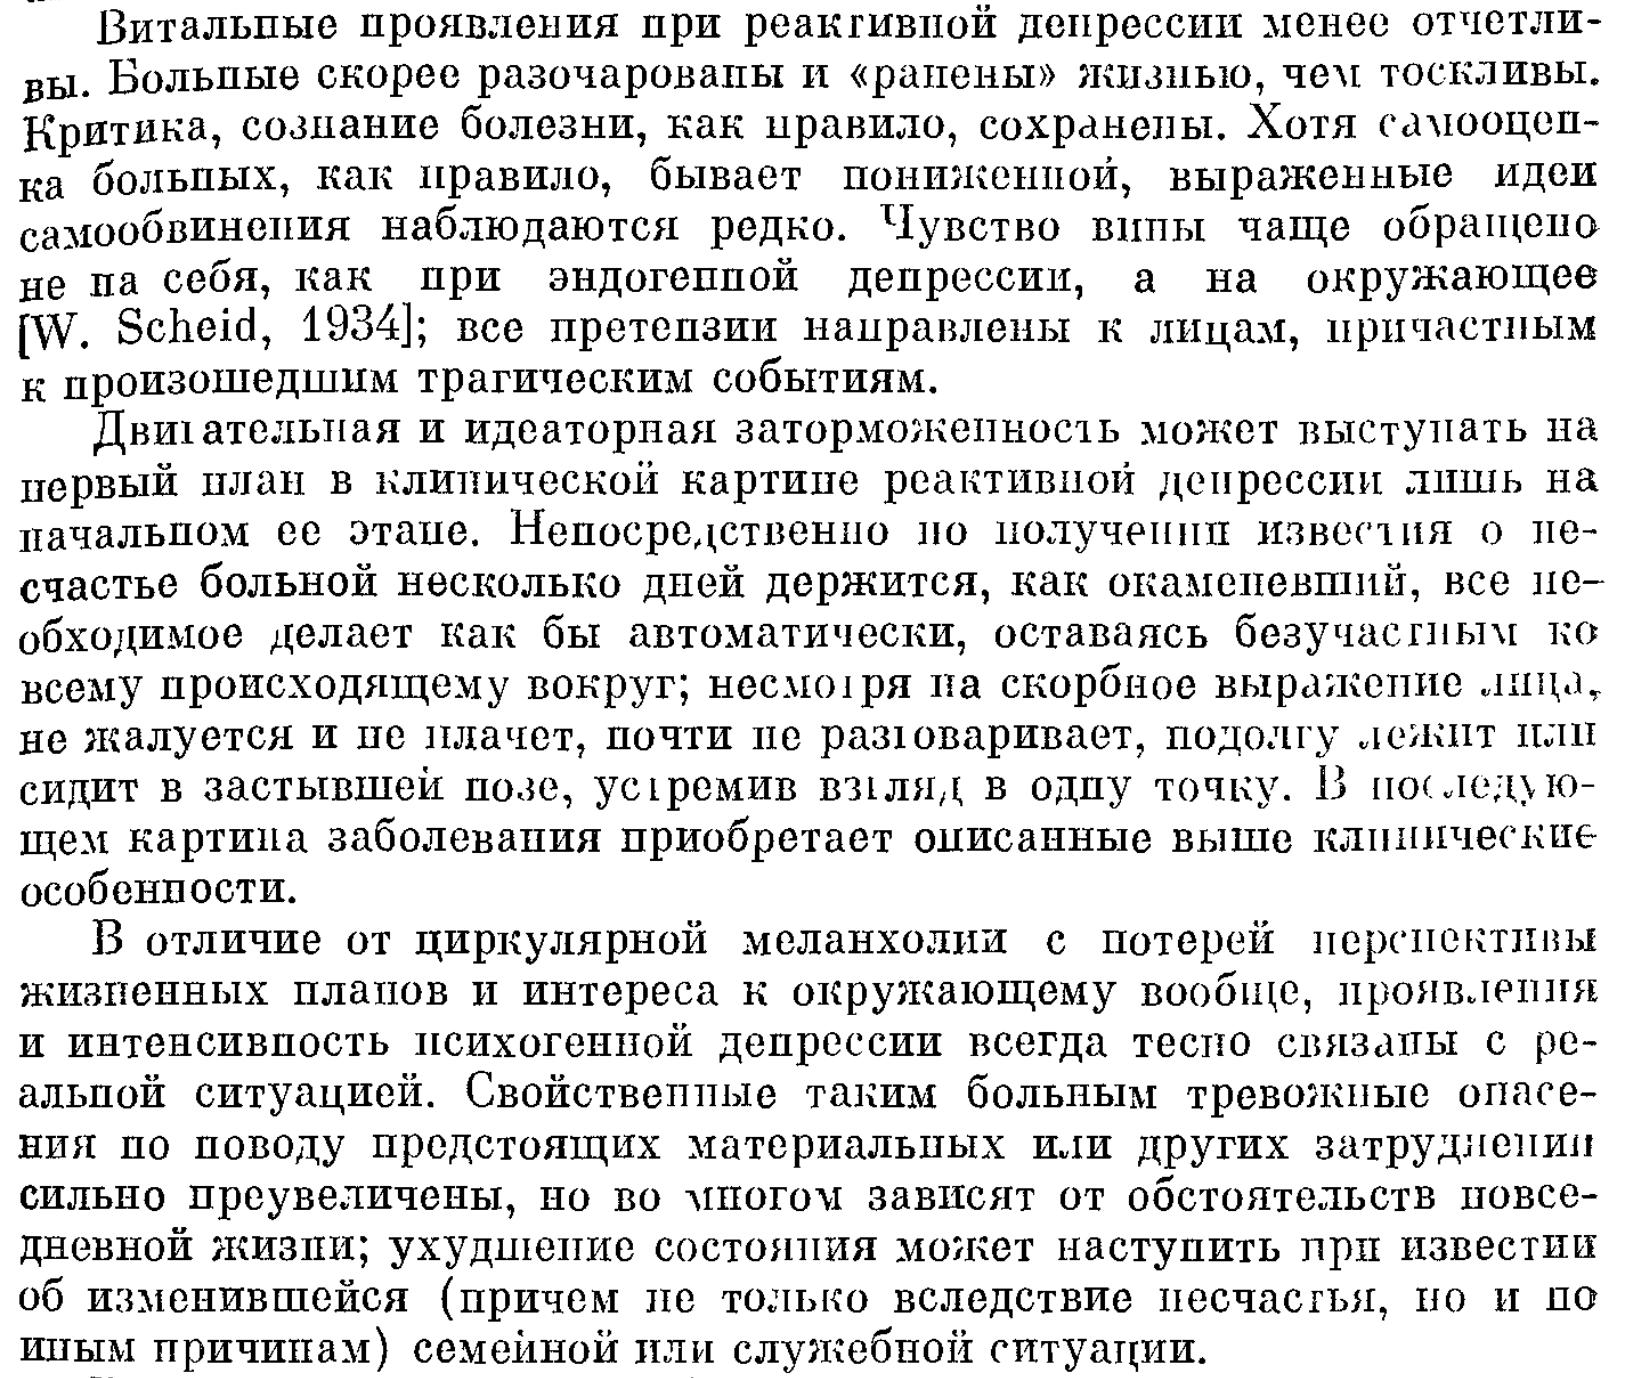 http://i6.imageban.ru/out/2017/06/01/8e07d9f29d73748e98fcf6268de4aec5.png